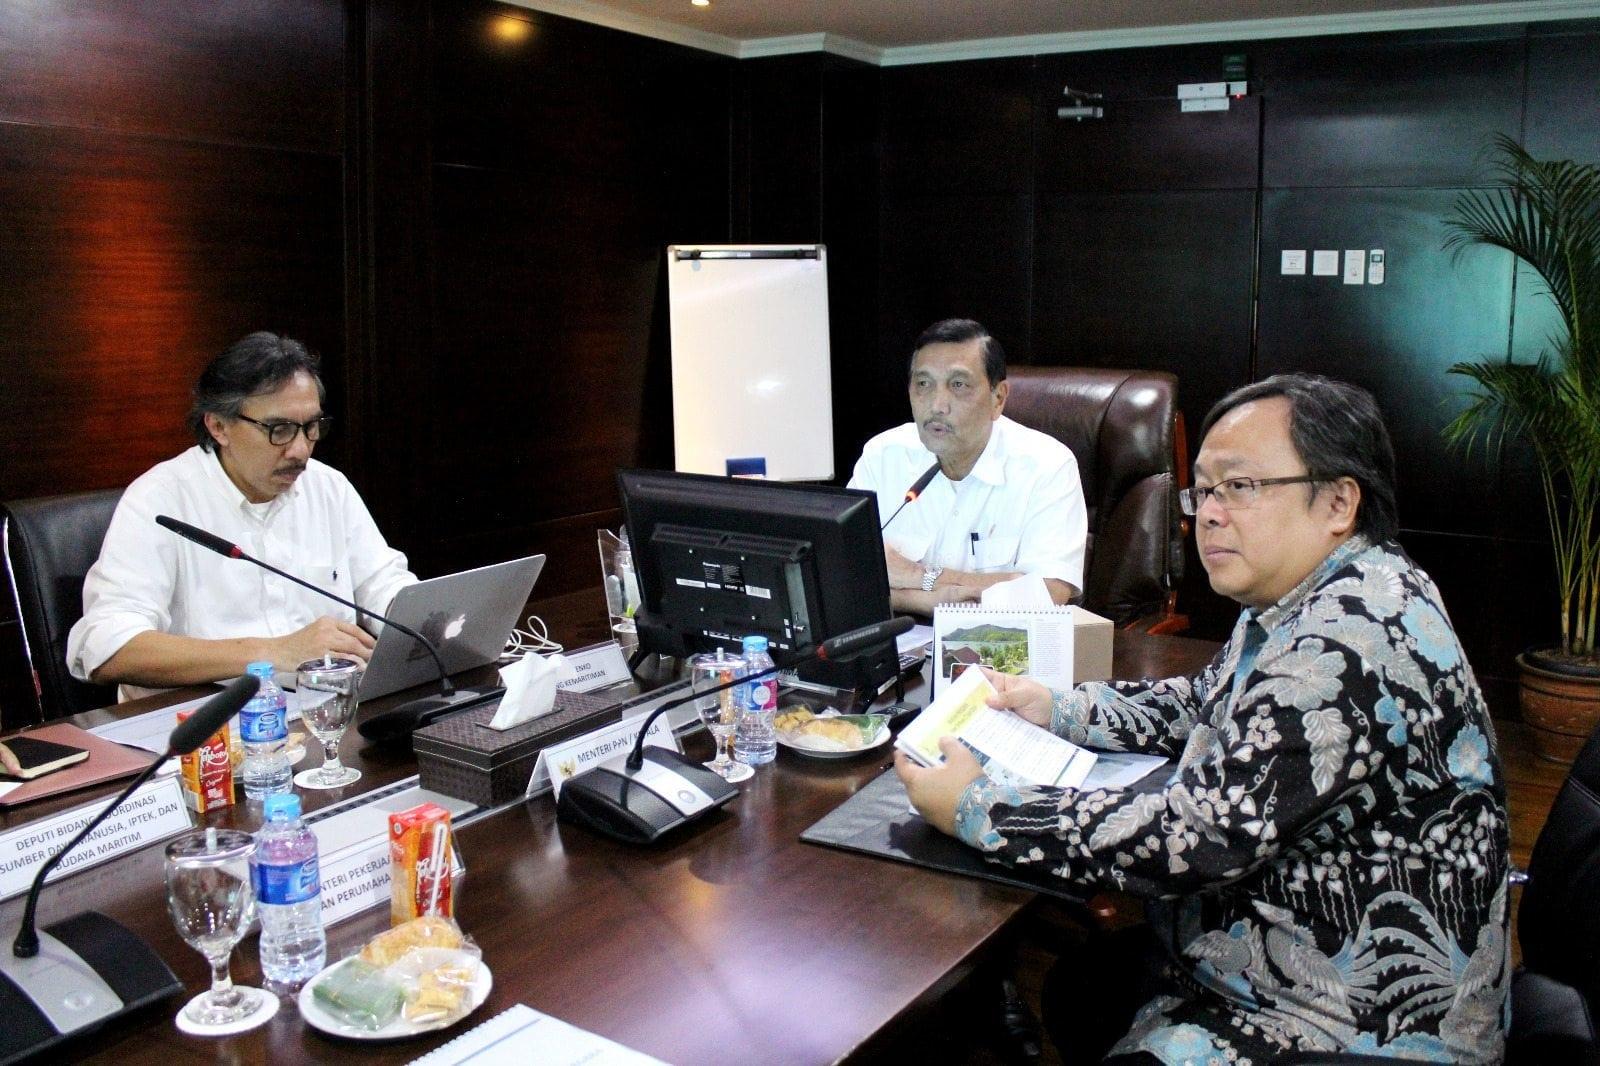 Menko Luhut B. Pandjaitan pimpin Rapat Koordinasi tentang NCICD, di Kantor Maritim